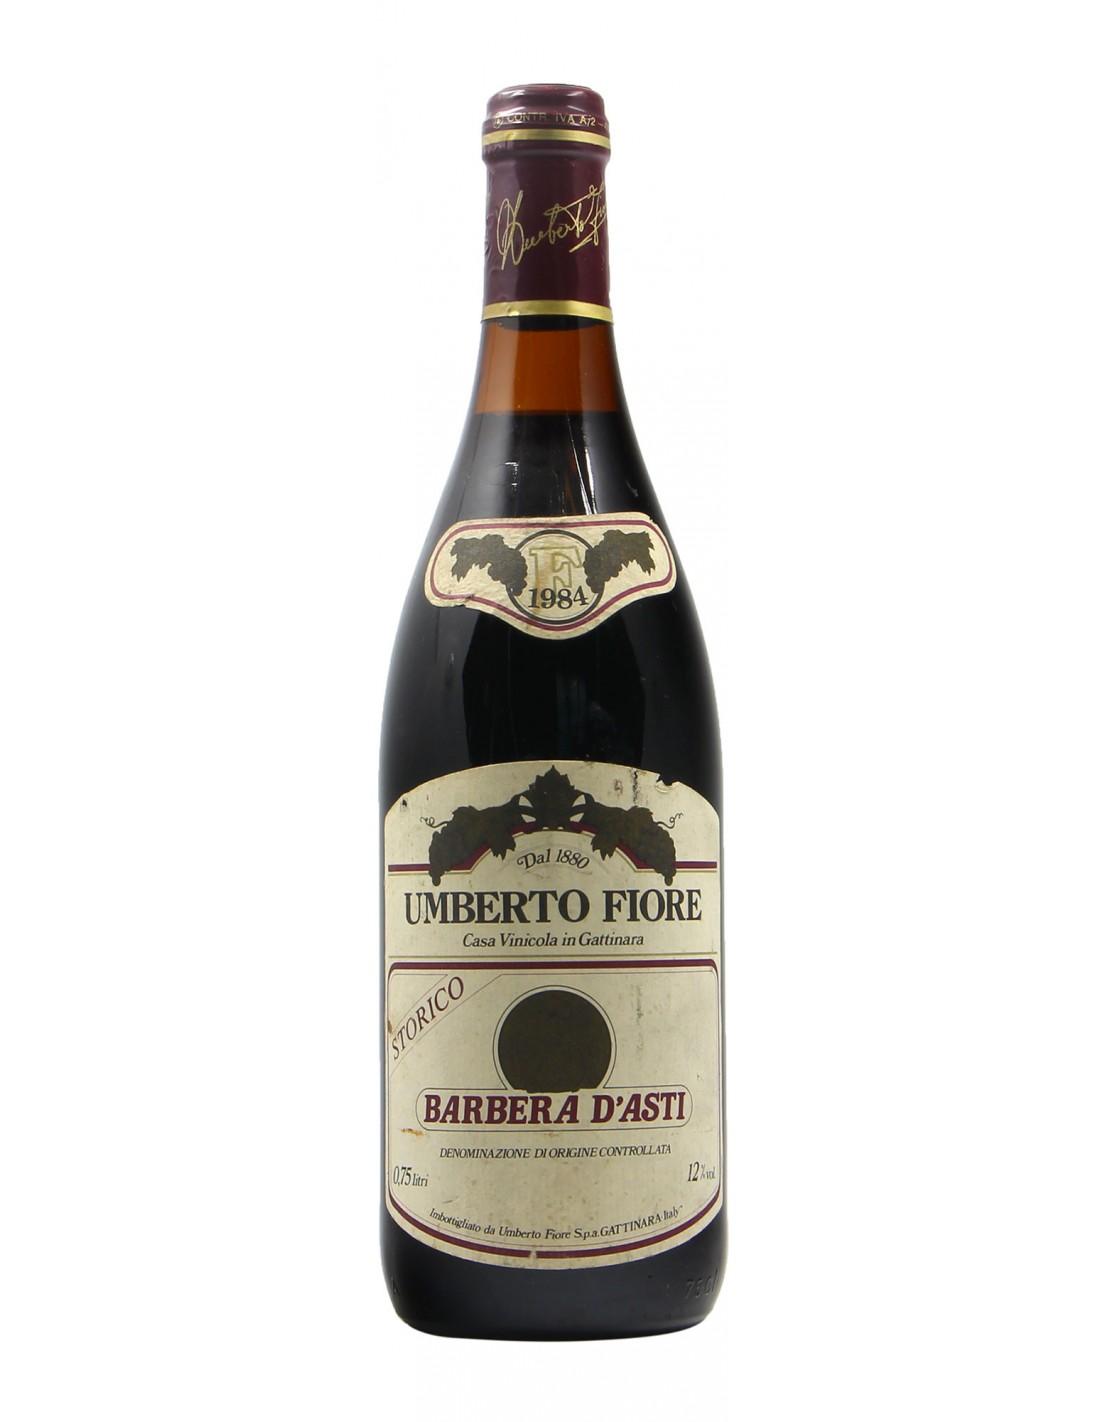 BARBERA D'ASTI 1984 UMBERTO FIORE Grandi Bottiglie